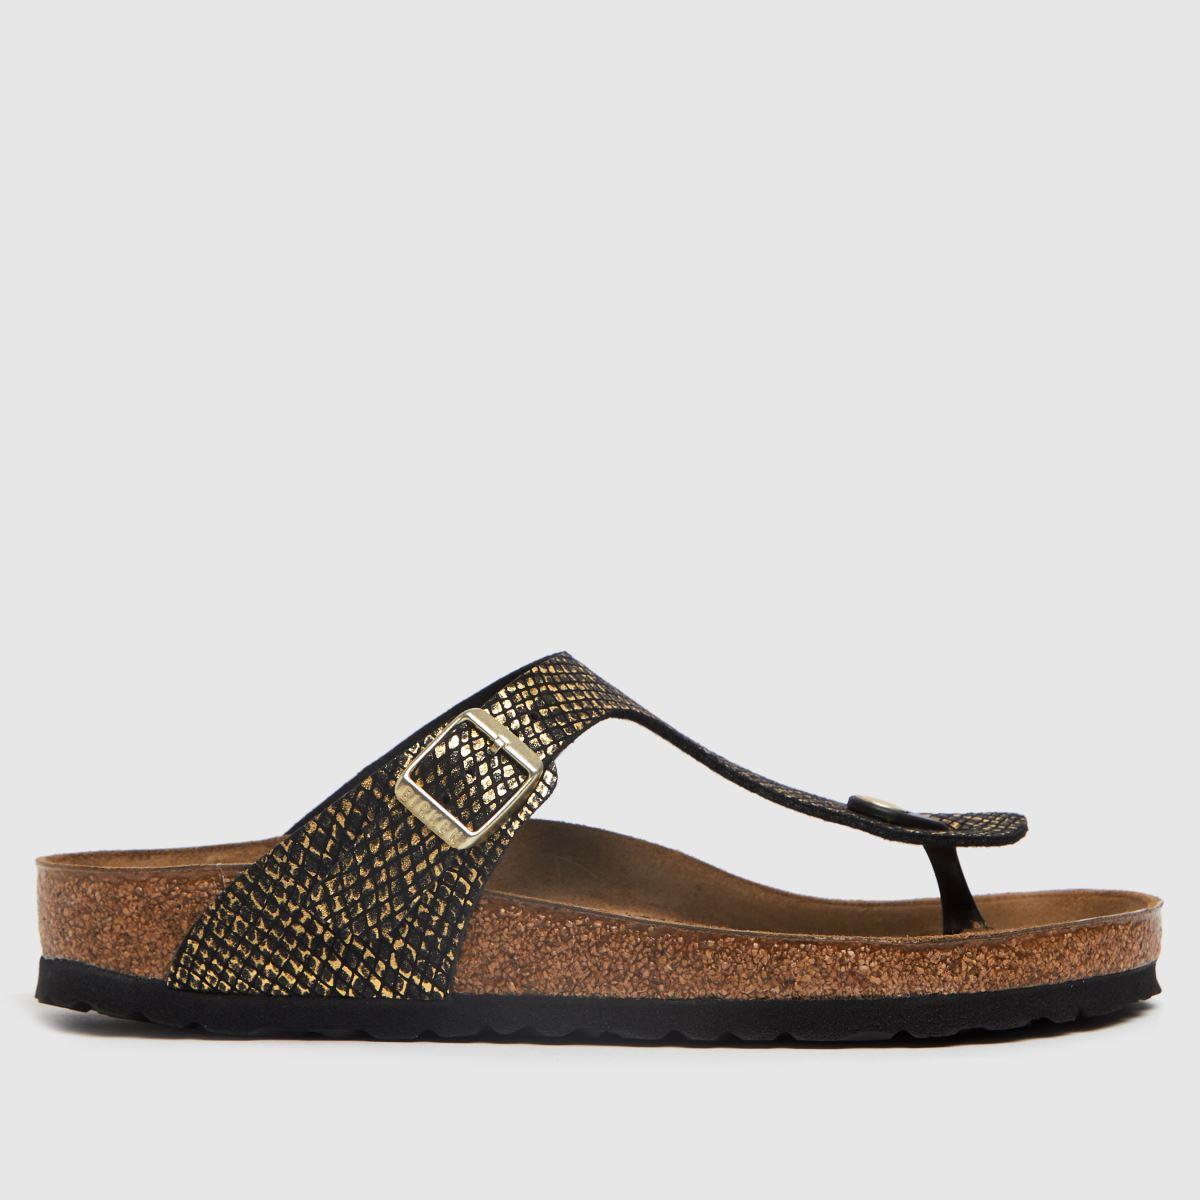 BIRKENSTOCK Black & Brown Gizeh Sandals